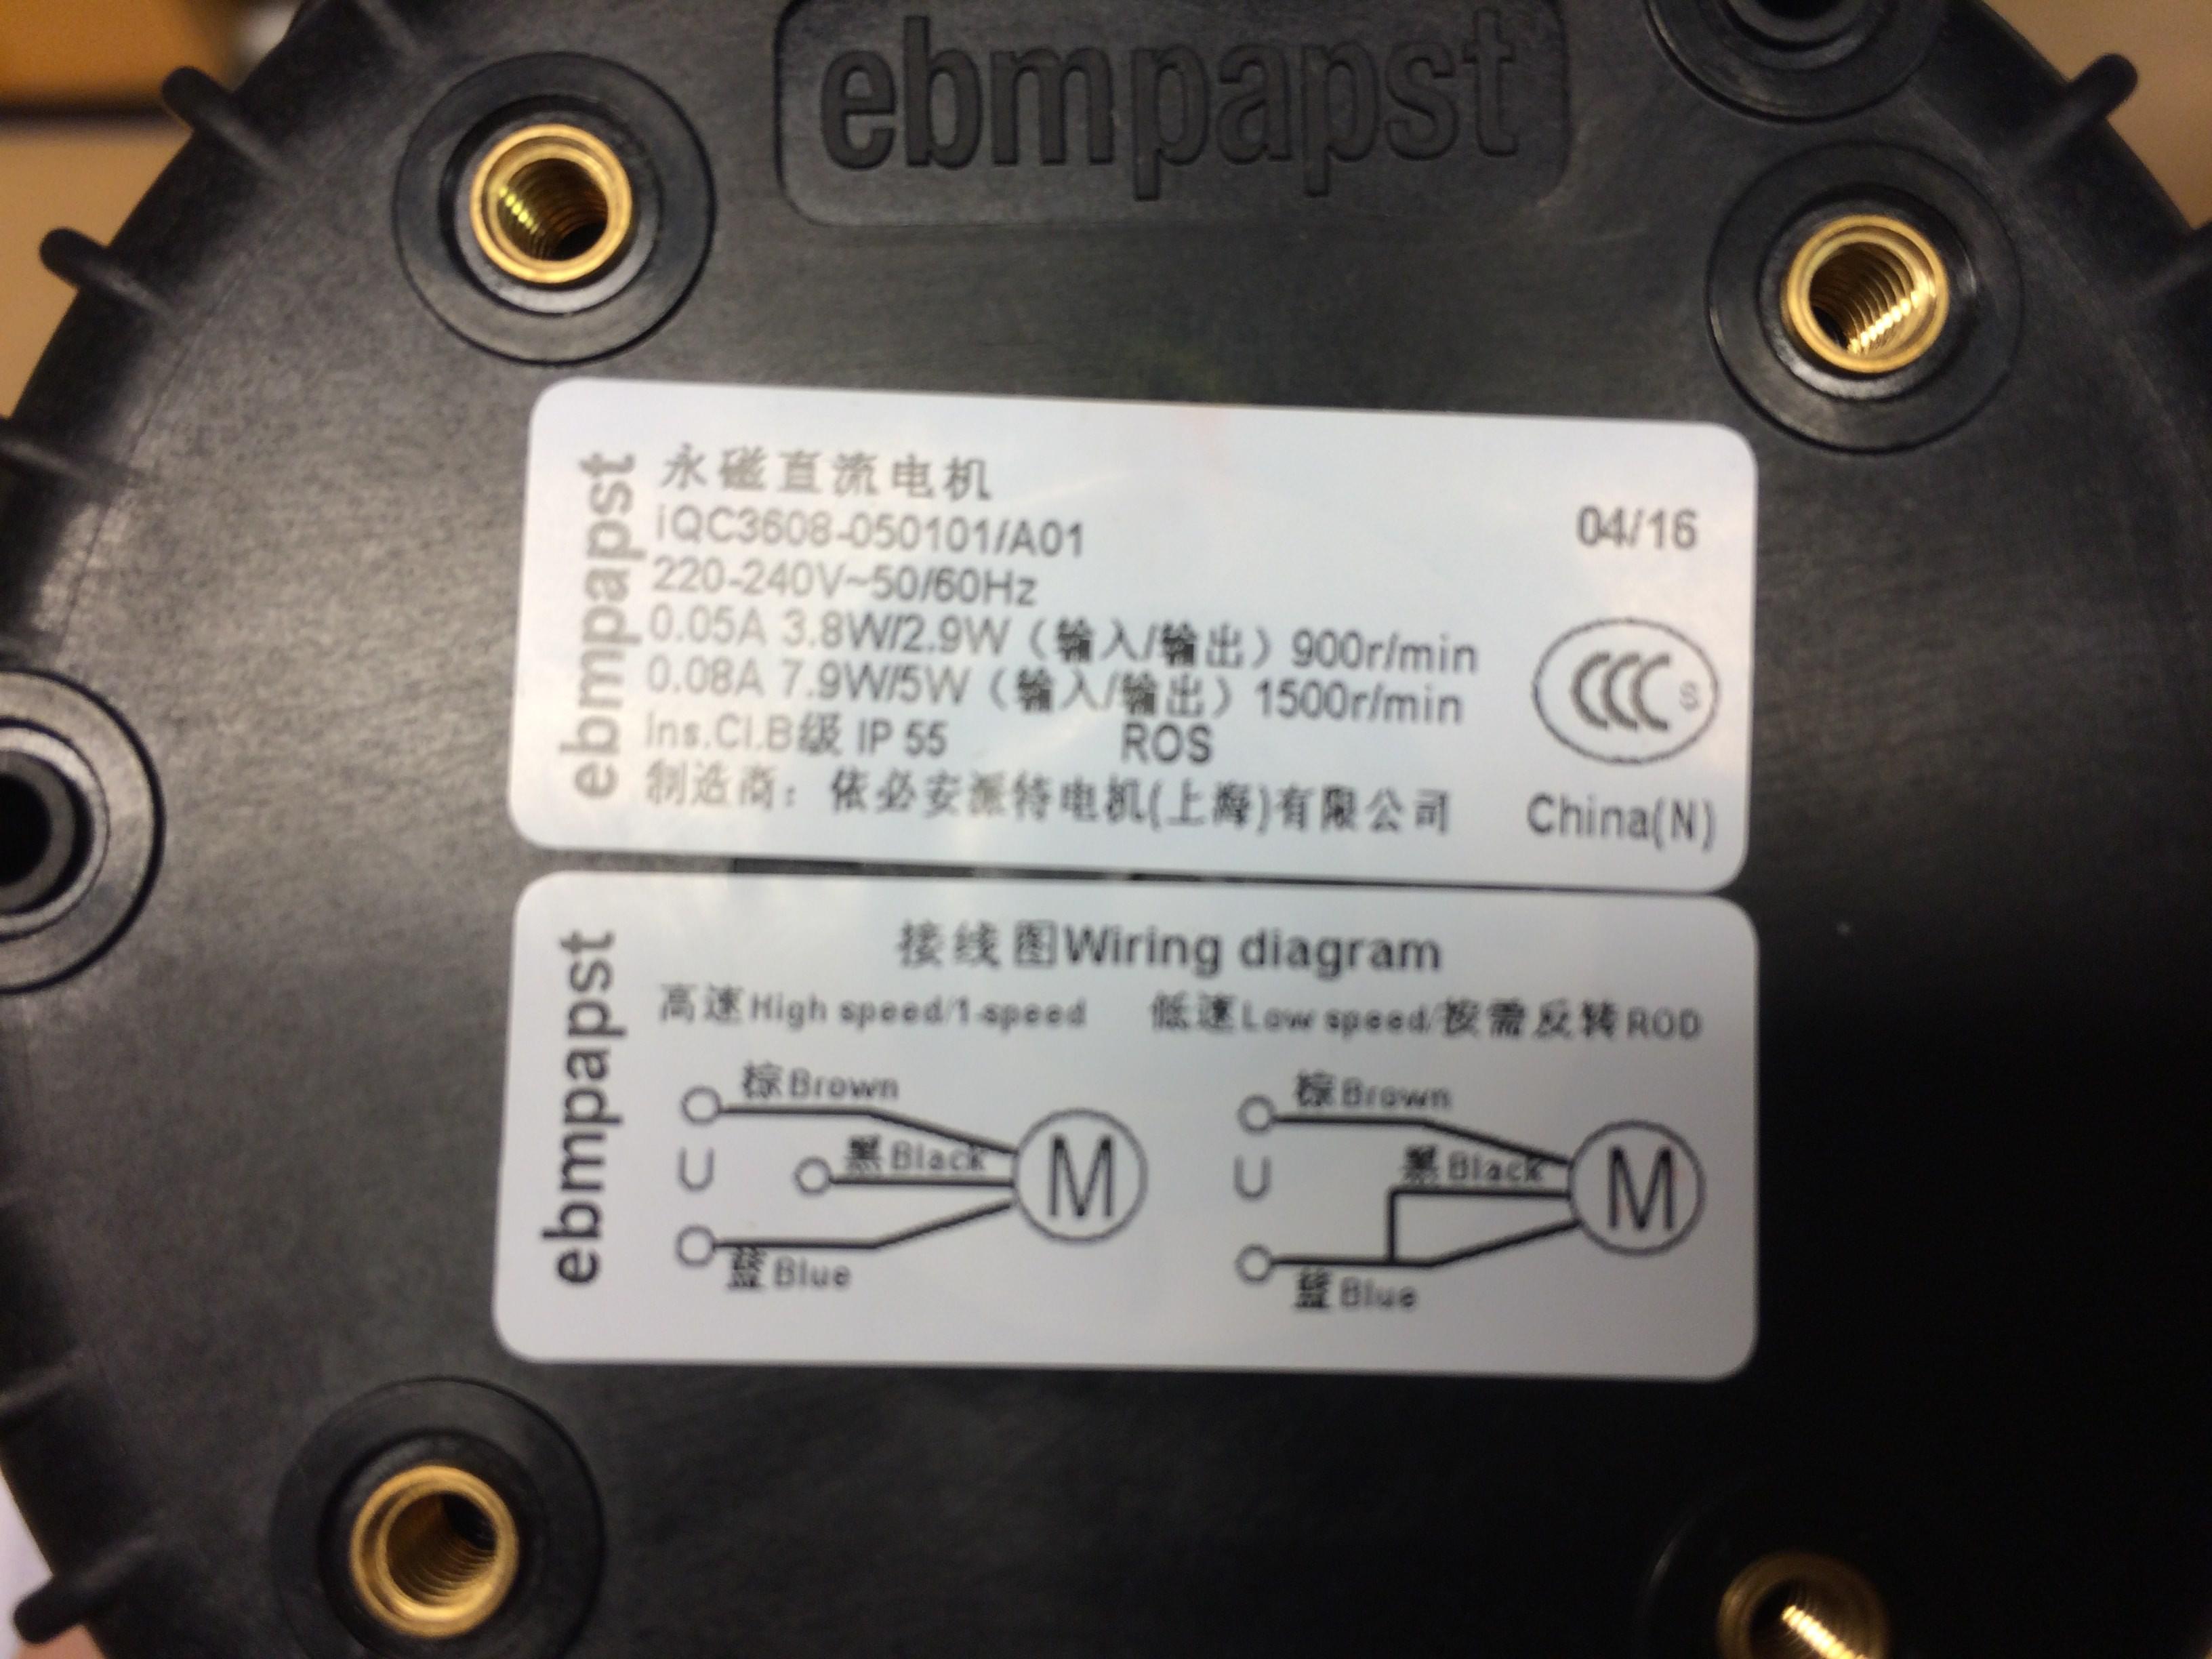 Rhino Moscow-293/Toronto-458 Condenser Fan Motor IQC3608